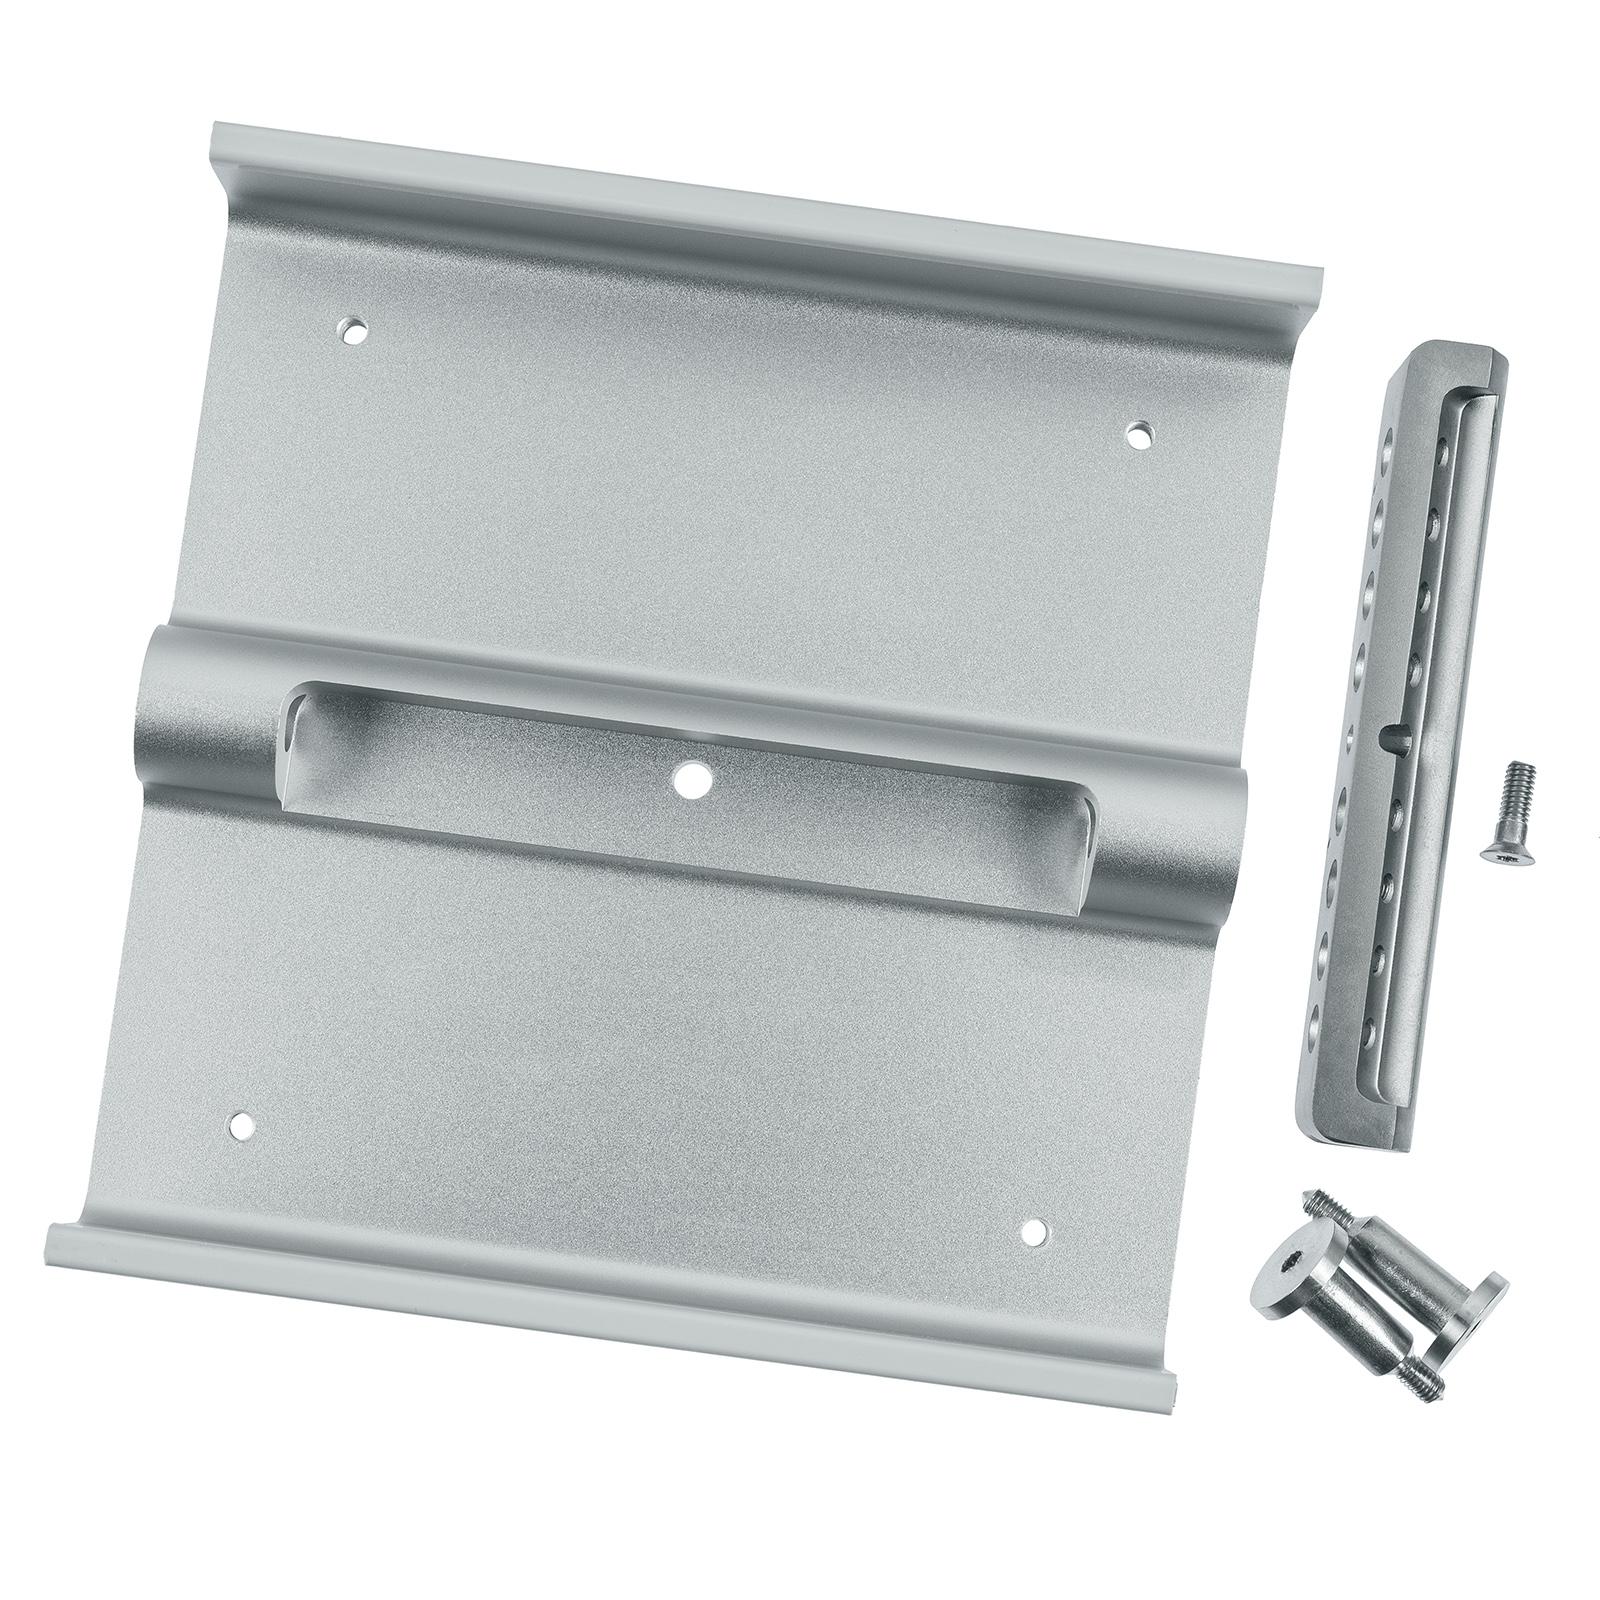 VESA Mount Adapter Kit for iMac, LED Cinema & Thunderbolt Display